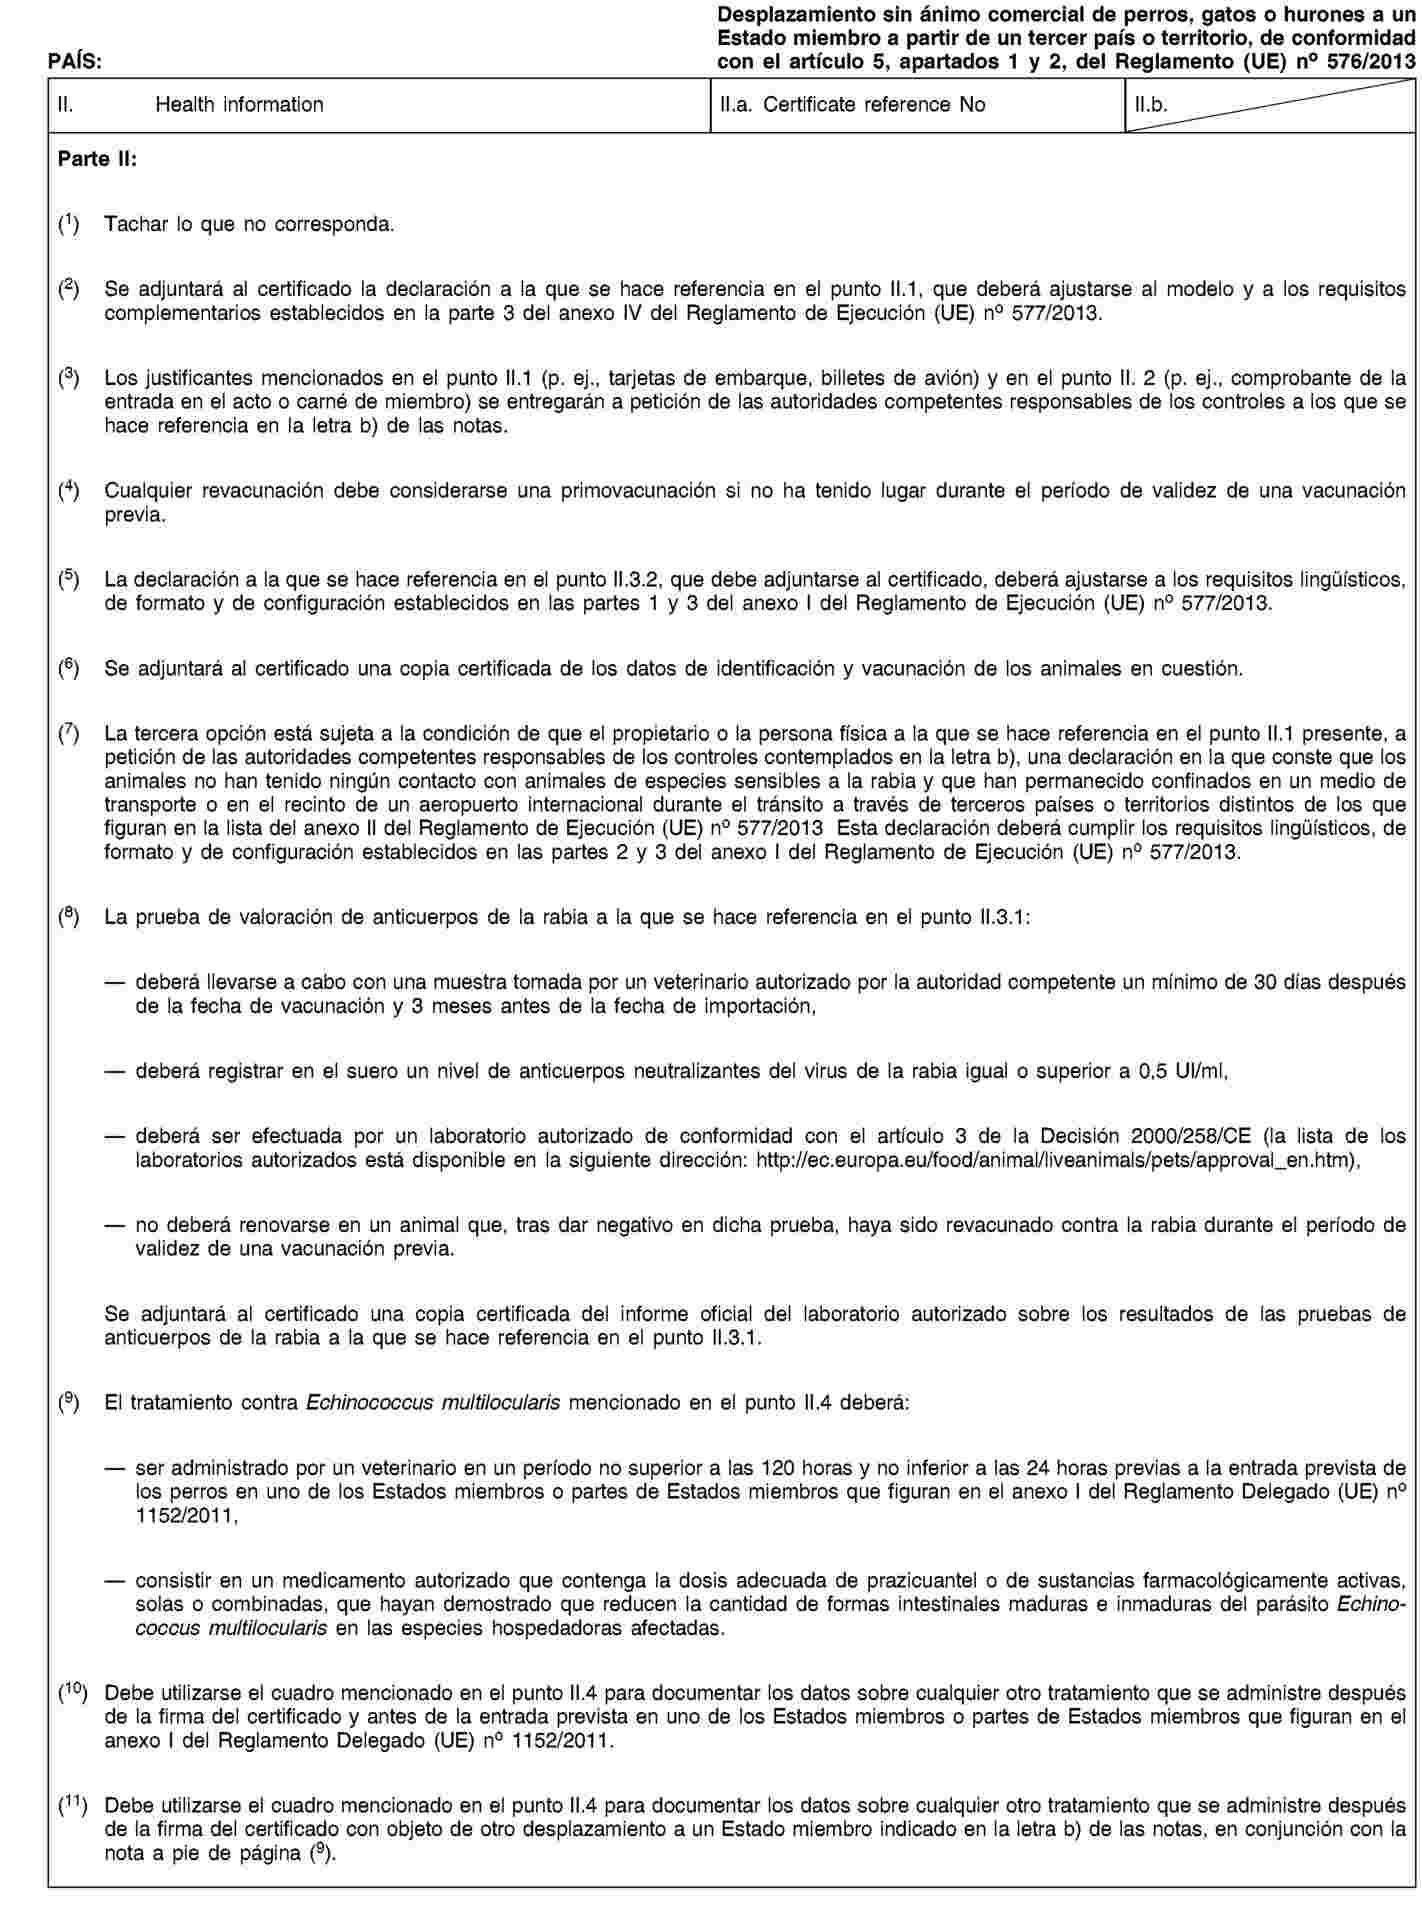 EUR-Lex - 32013R0577 - EN - EUR-Lex